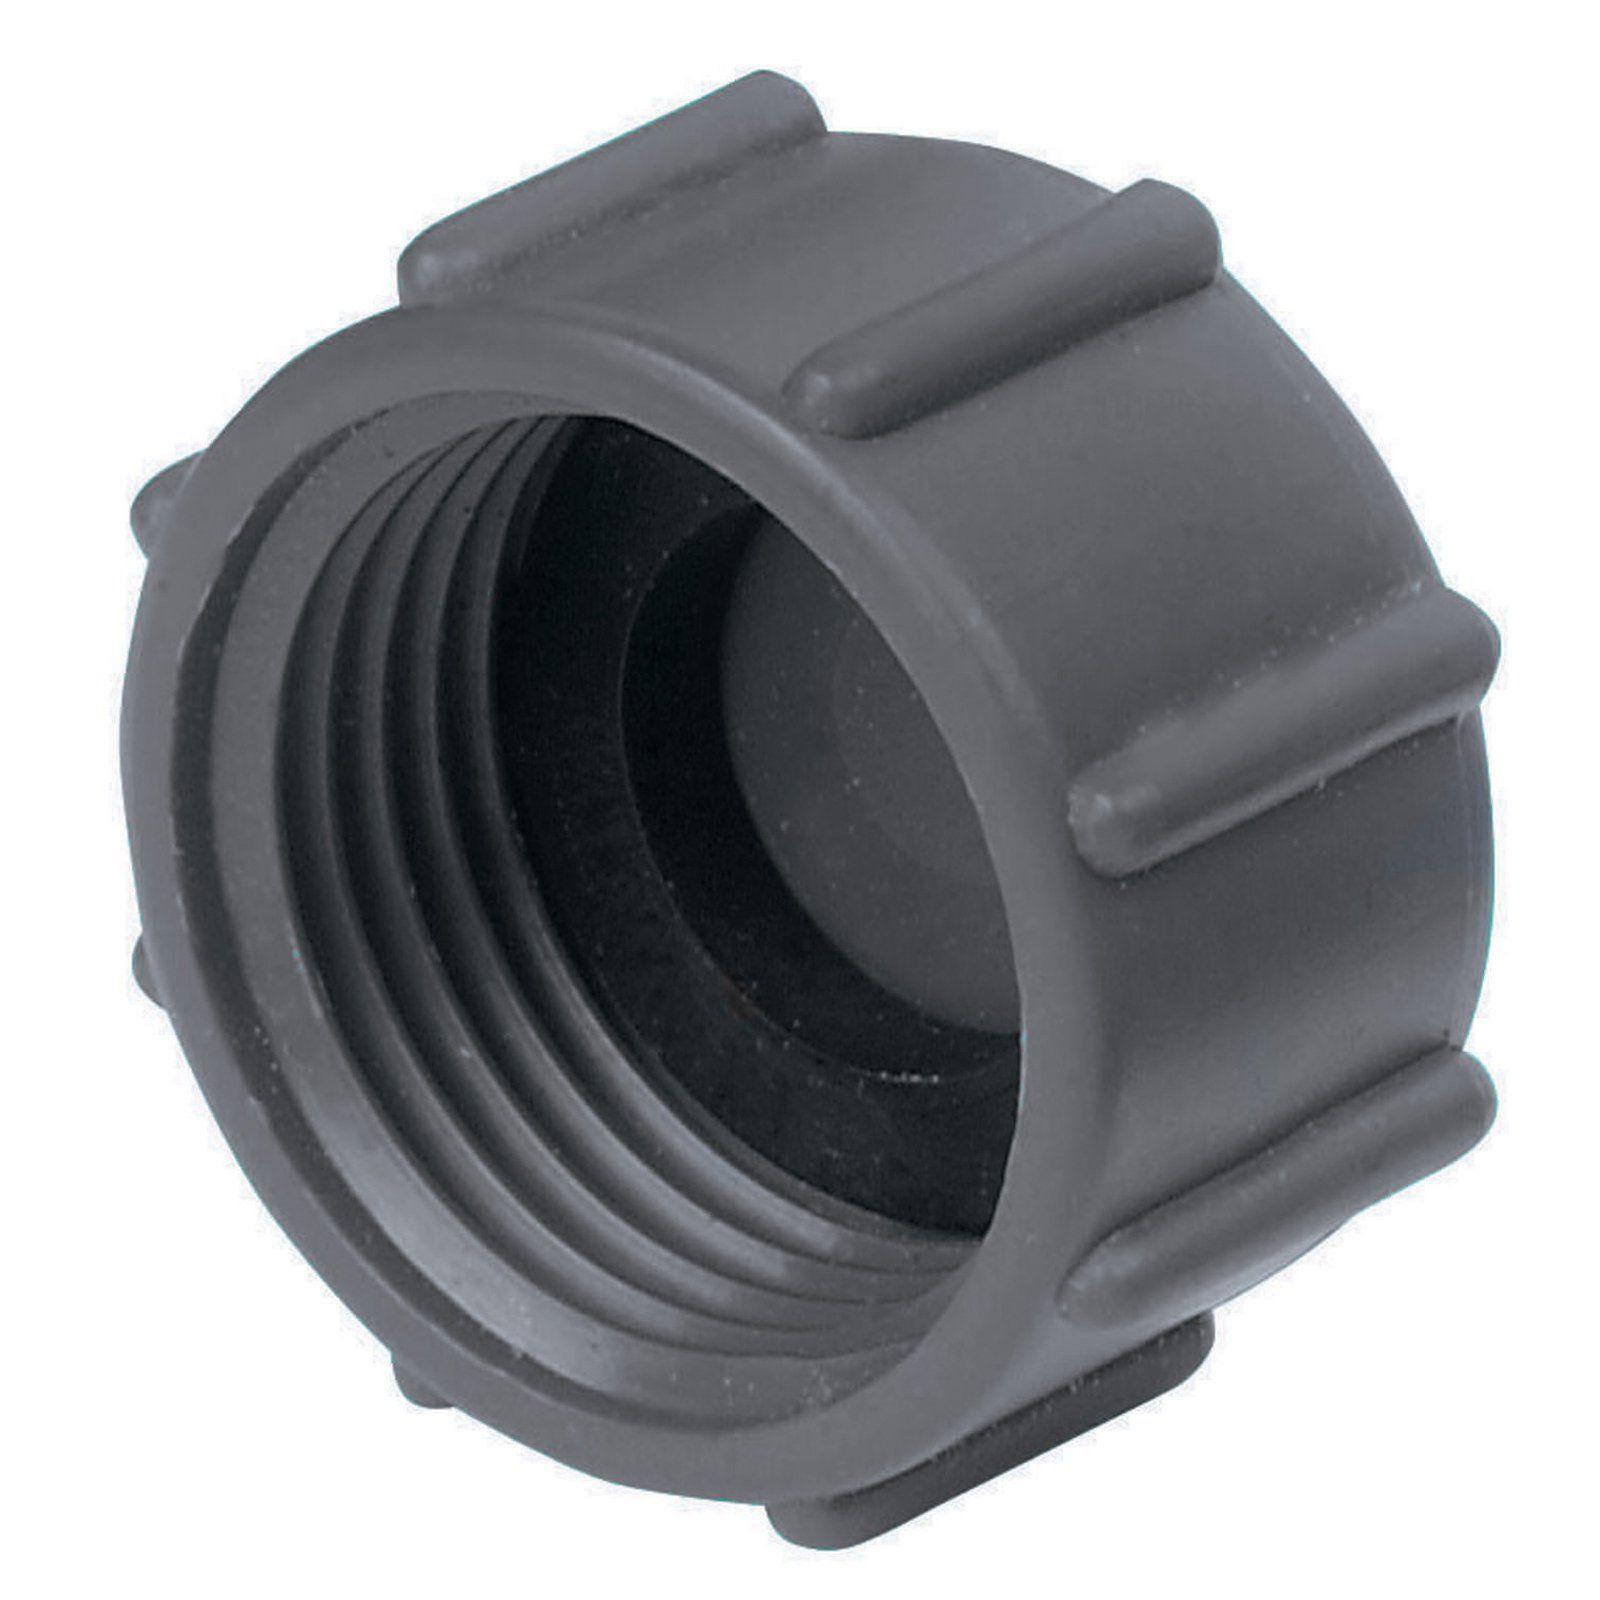 Gilmour 04HCC Polymer Hose Cap - Set of 2 - 1403-0498